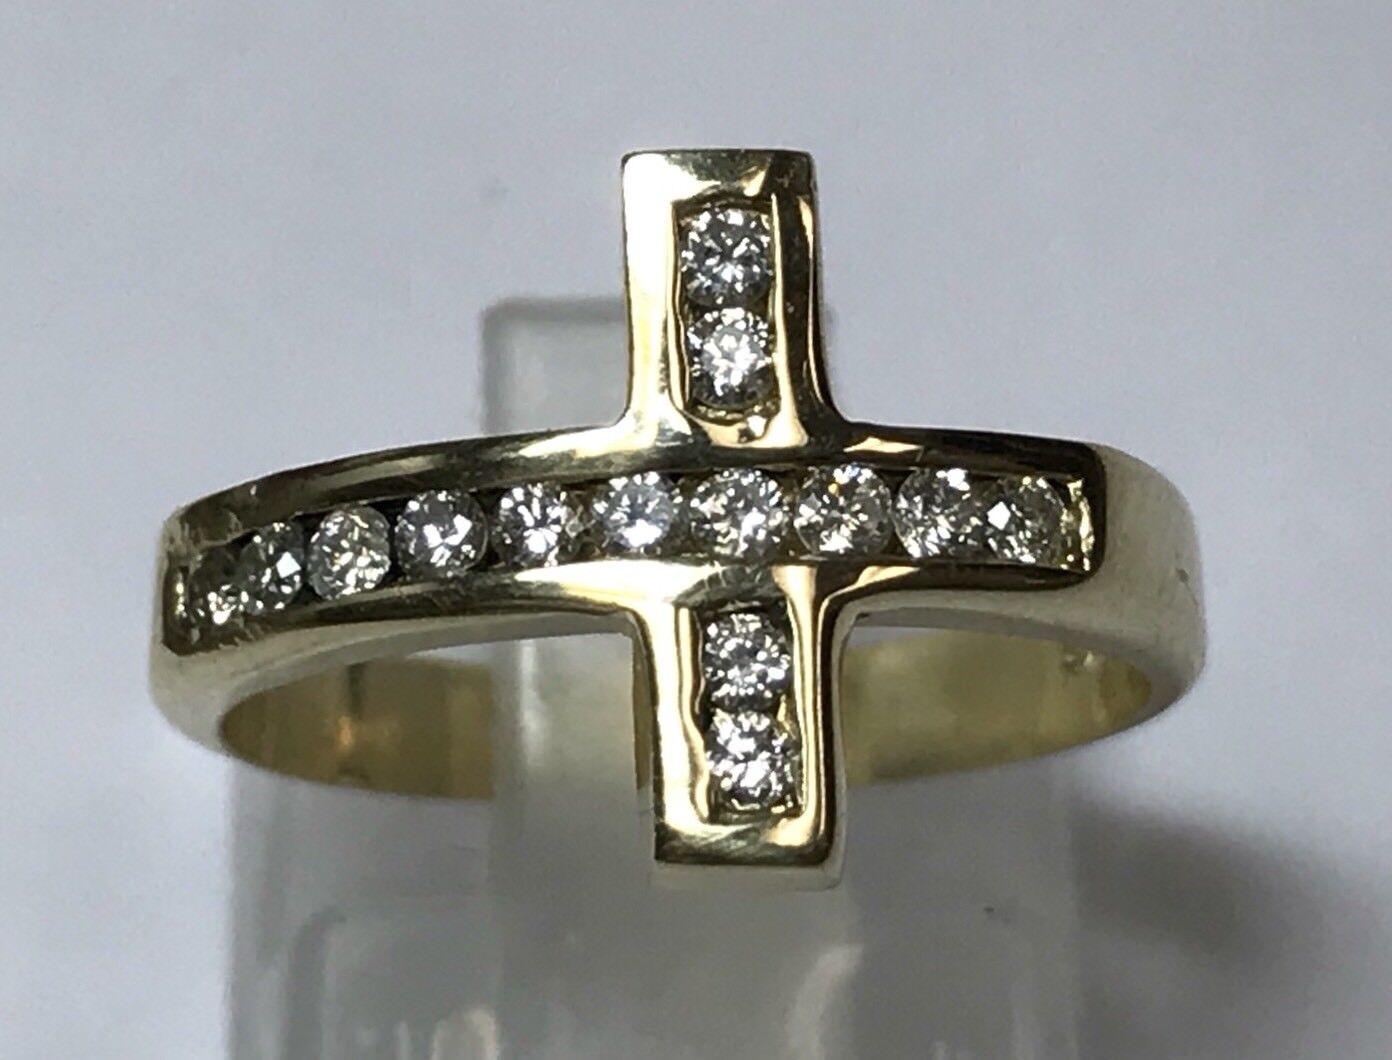 14K YELLOW gold DIAMOND CROSS RING MENS CHRISTIAN CATHOLIC UNISEX SZ 5.75